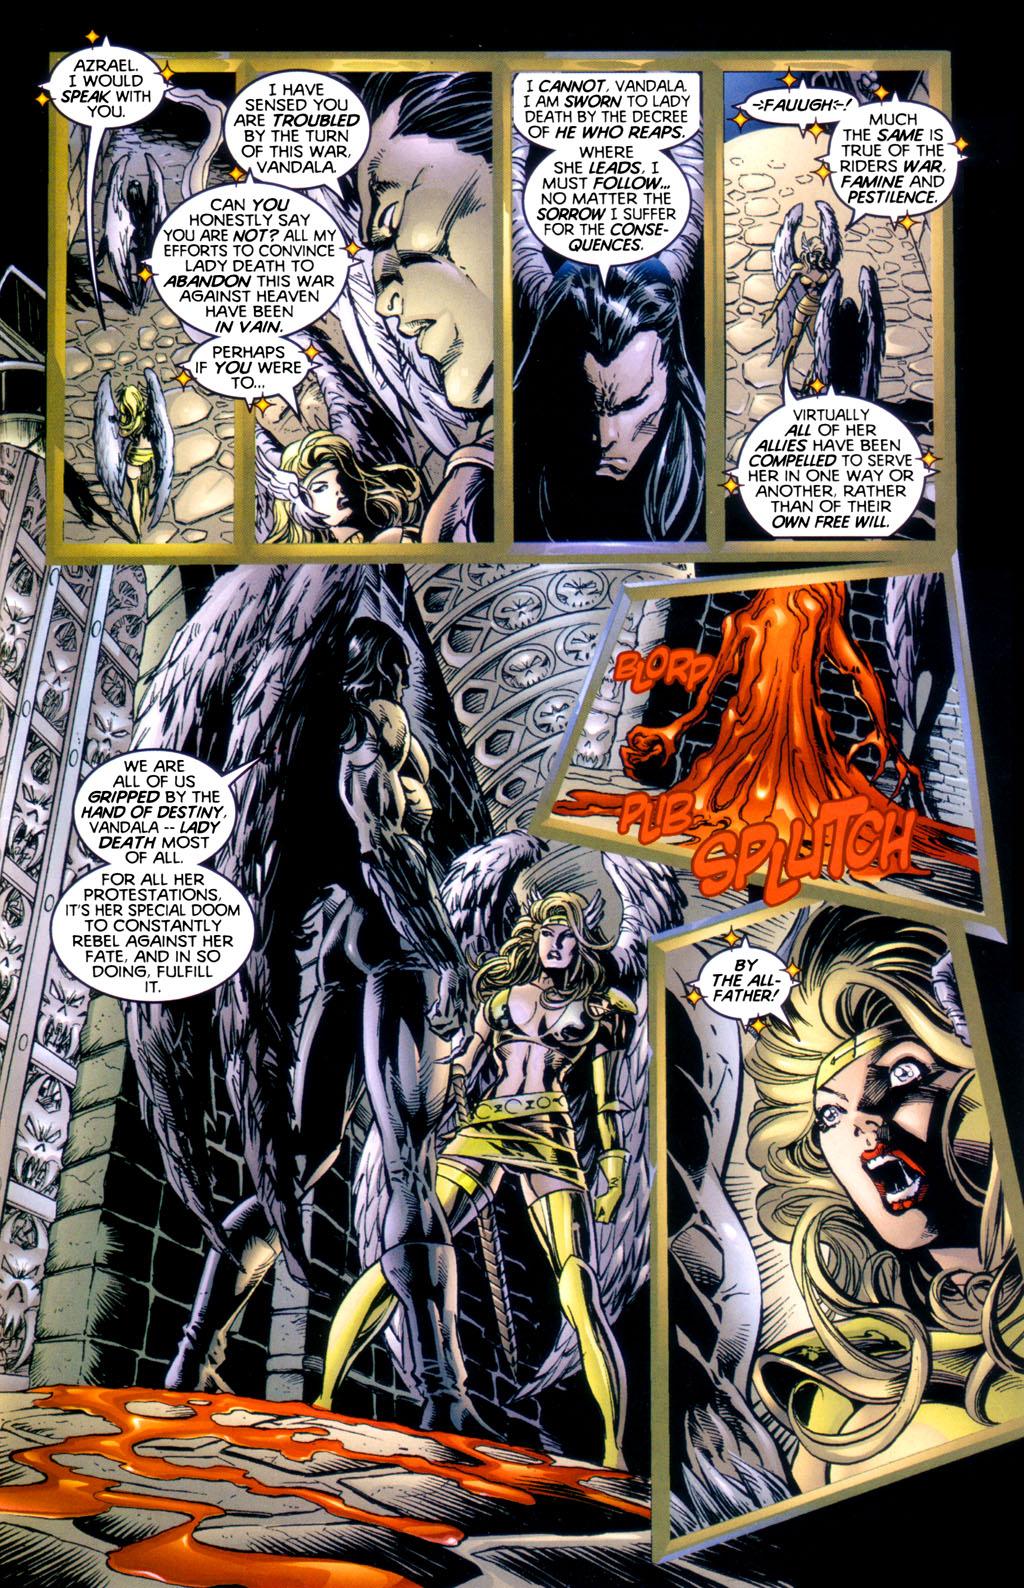 Read online Lady Death vs. Purgatori comic -  Issue # Full - 5